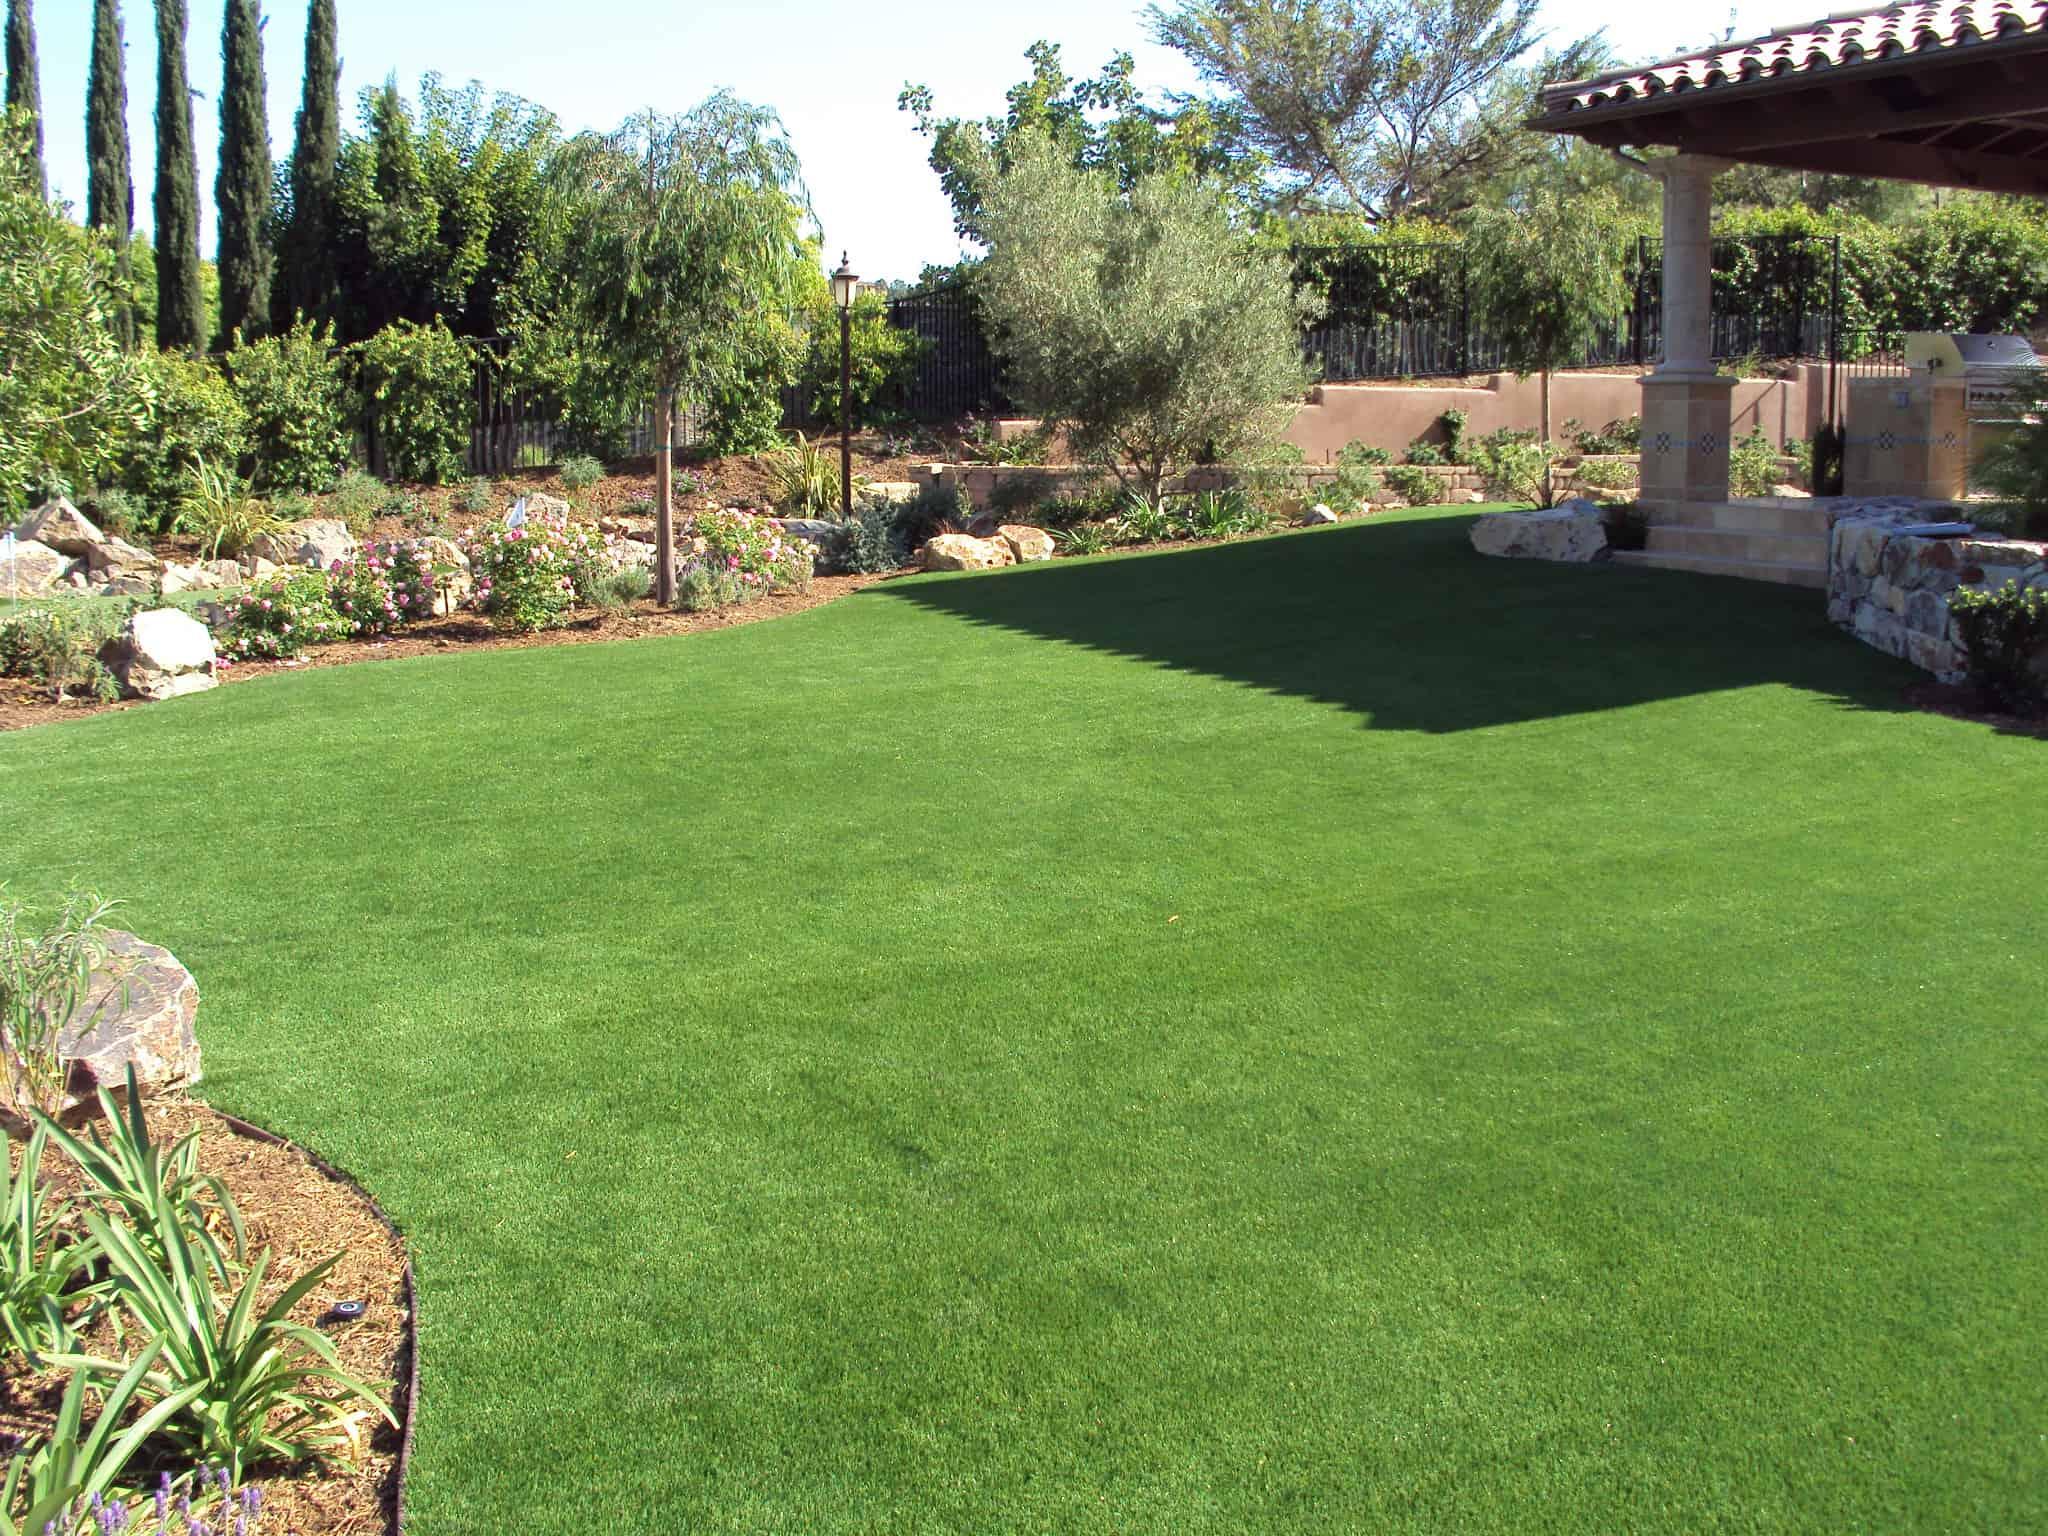 Backyard Summer Fun Family Activities - EasyTurf ... on Artificial Grass Backyard Ideas  id=69431